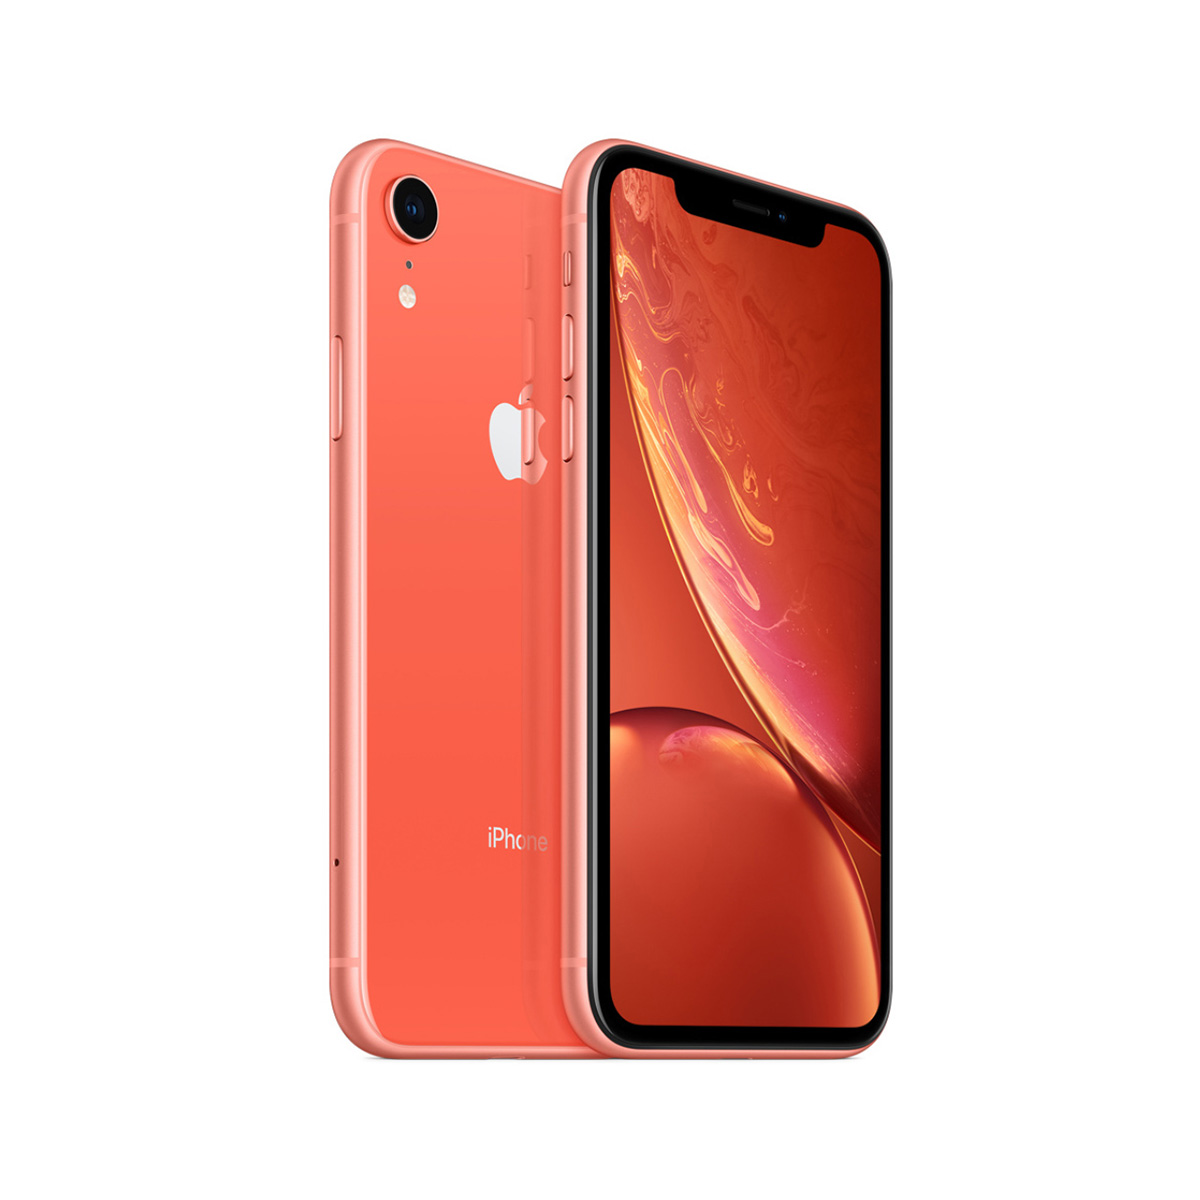 Apple iPhone Xr 64gb Tela 6.1' 4g 12mp Original - Mostruário